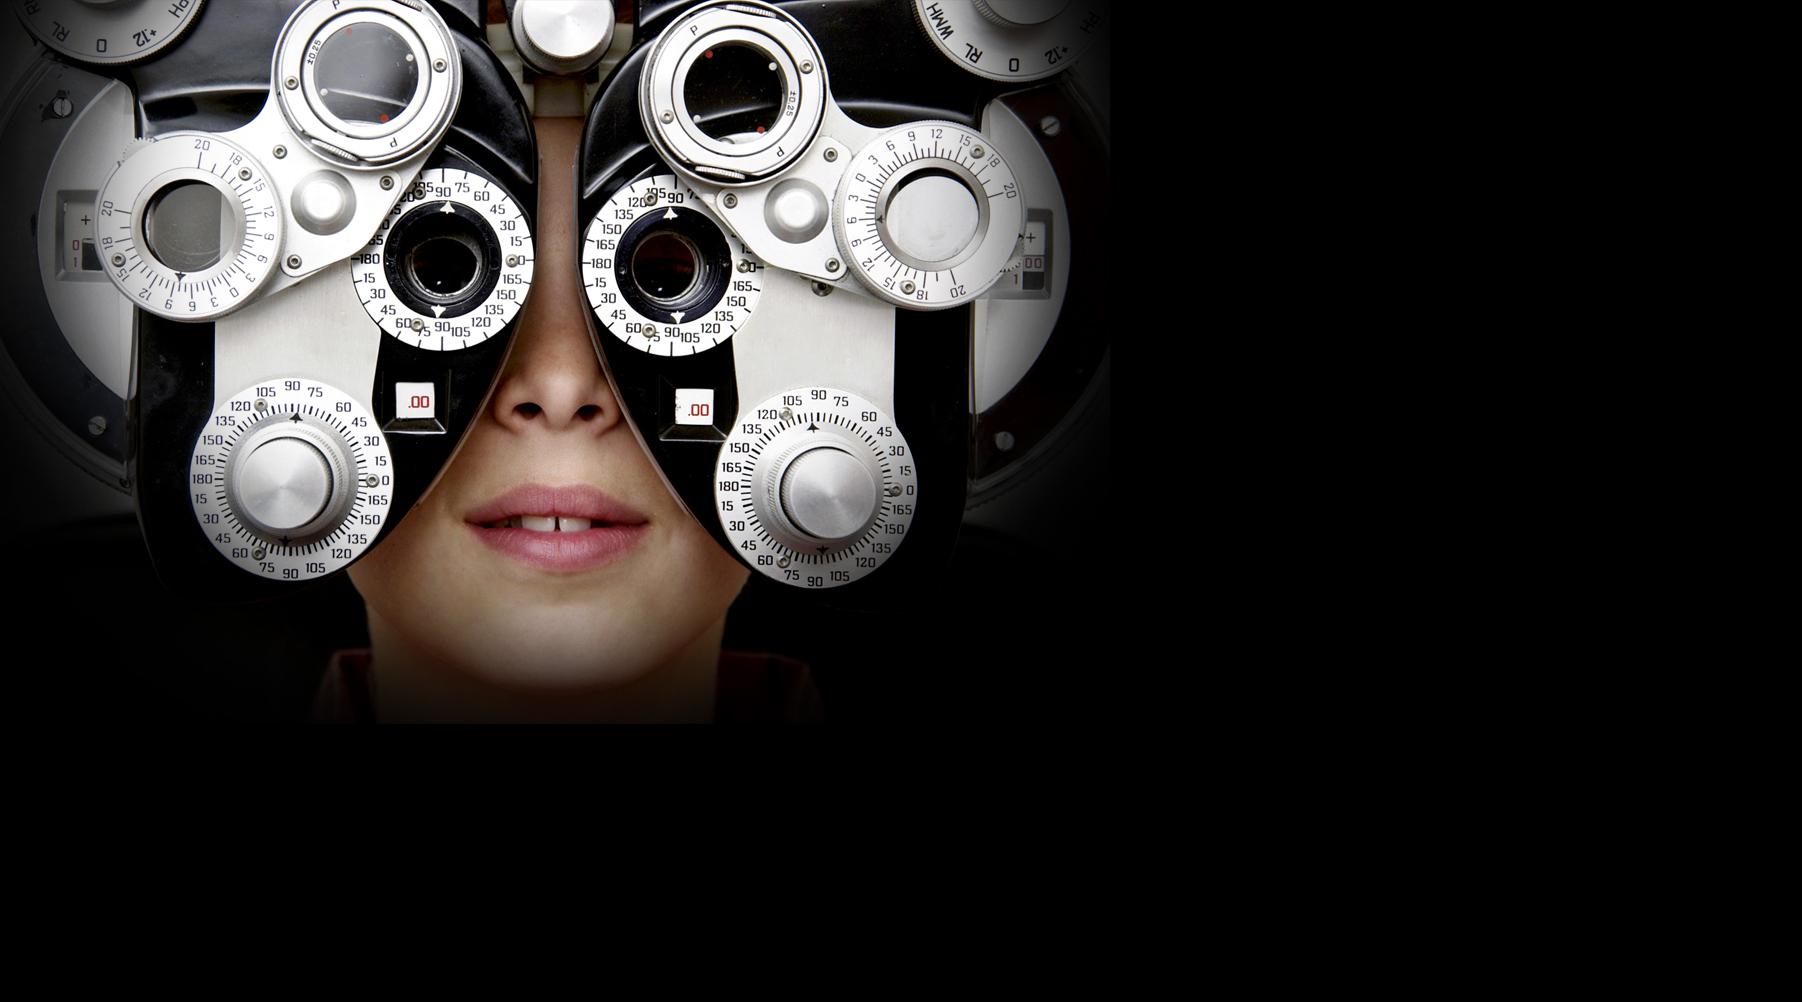 eye exams1.jpg